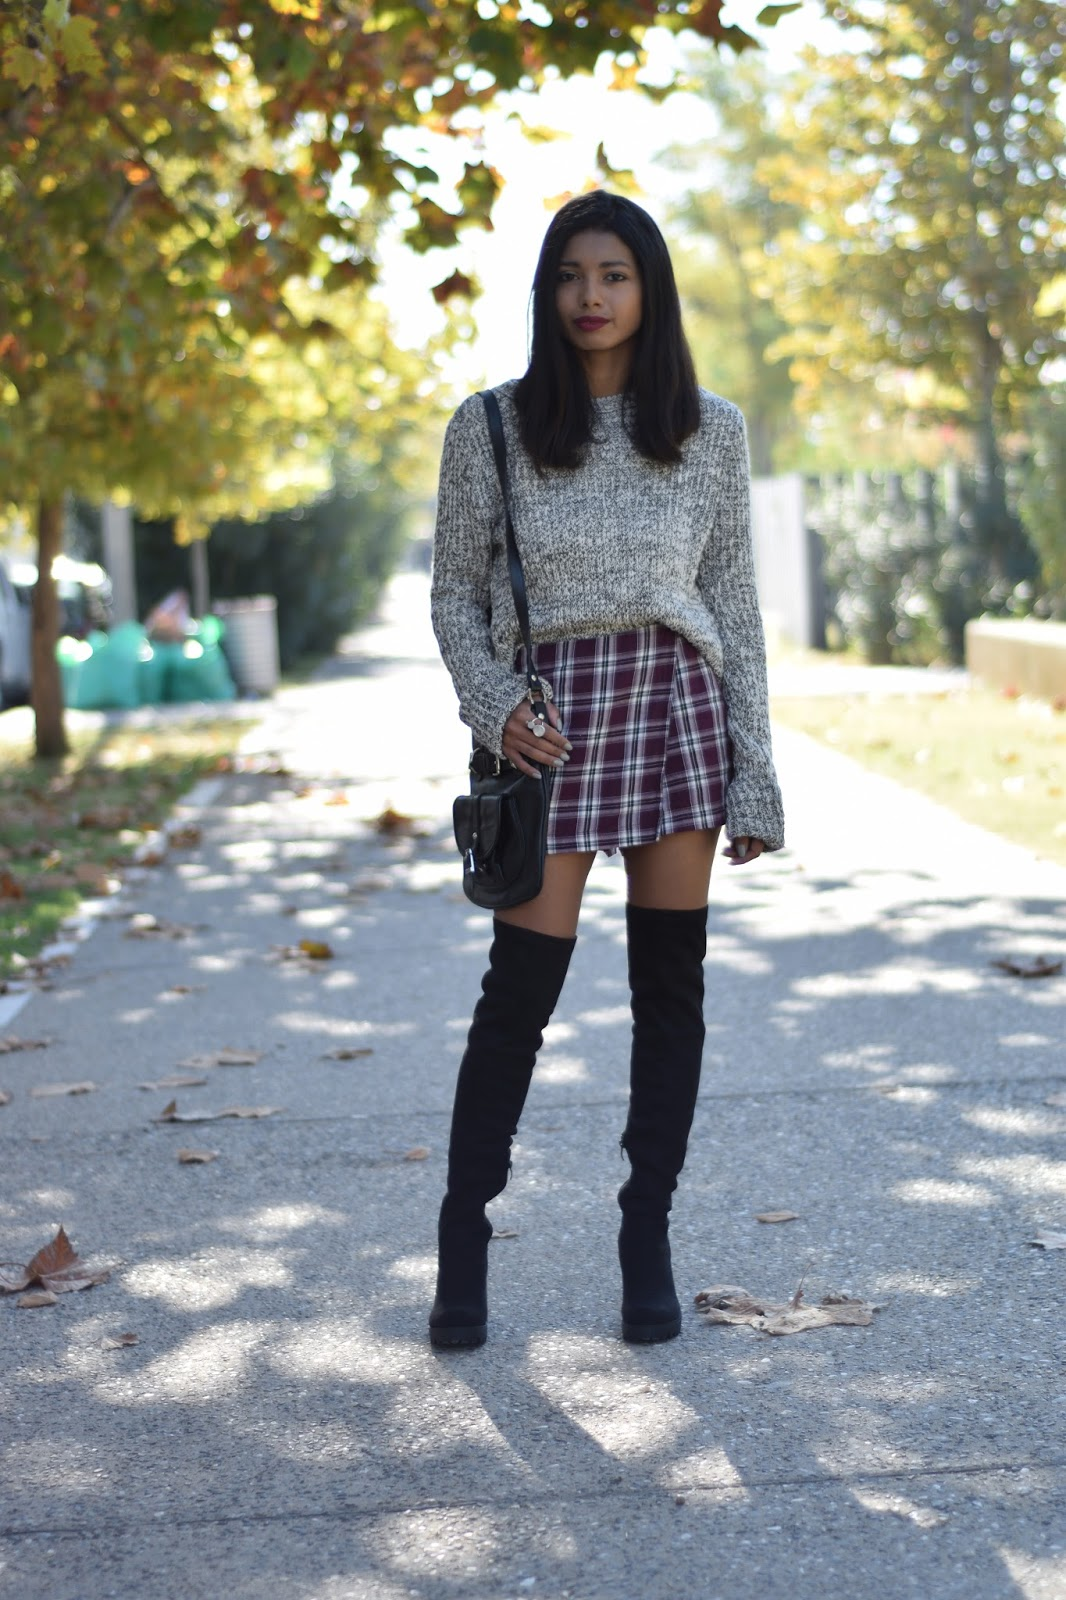 k meets style TiverIsland thigh boots topshot tartan skorts and cozy sweater